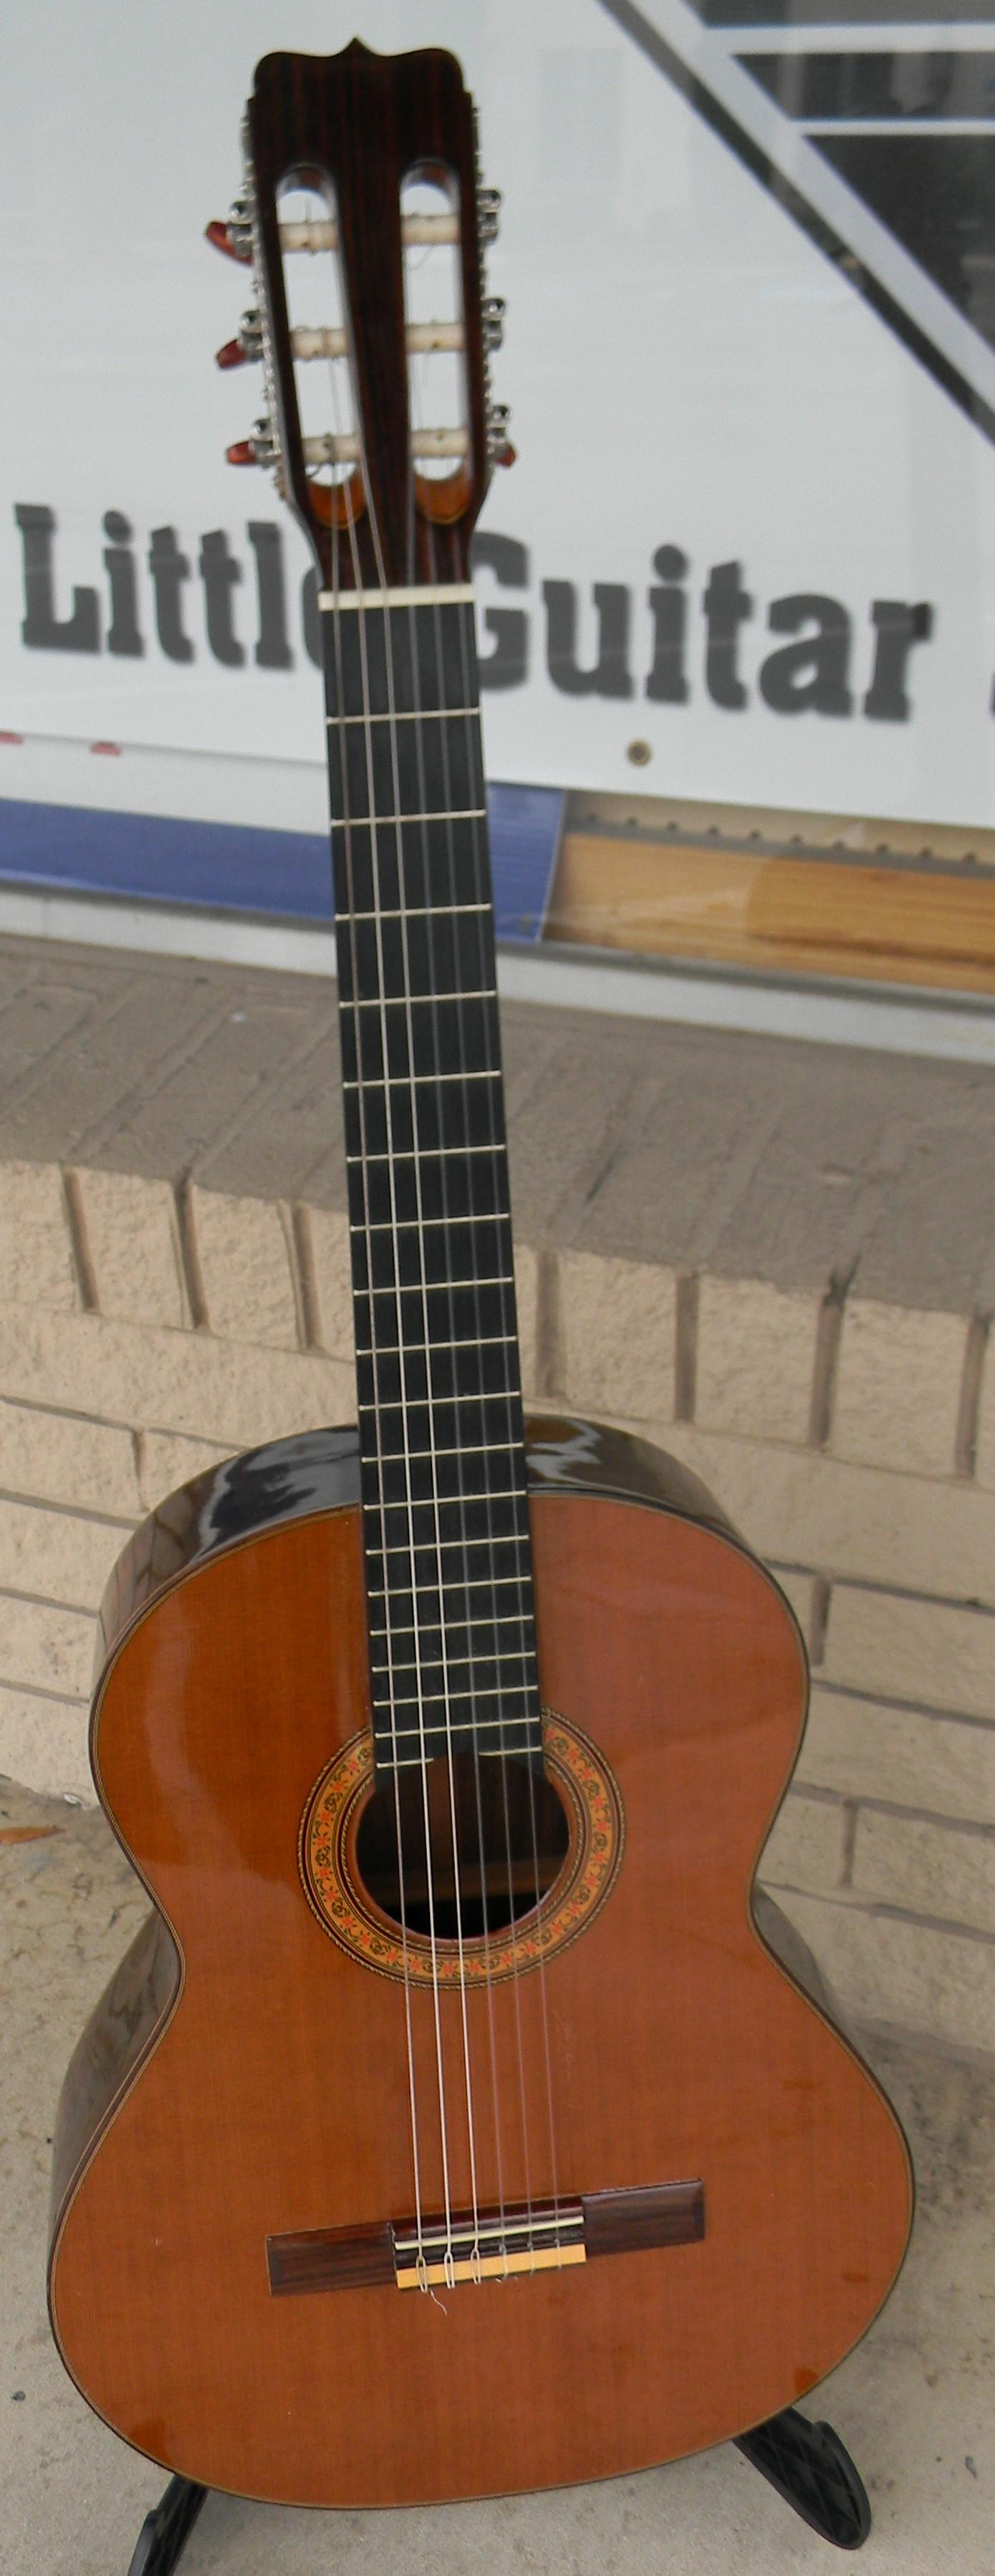 dscn1636 san antonio guitar store guitar tex. Black Bedroom Furniture Sets. Home Design Ideas